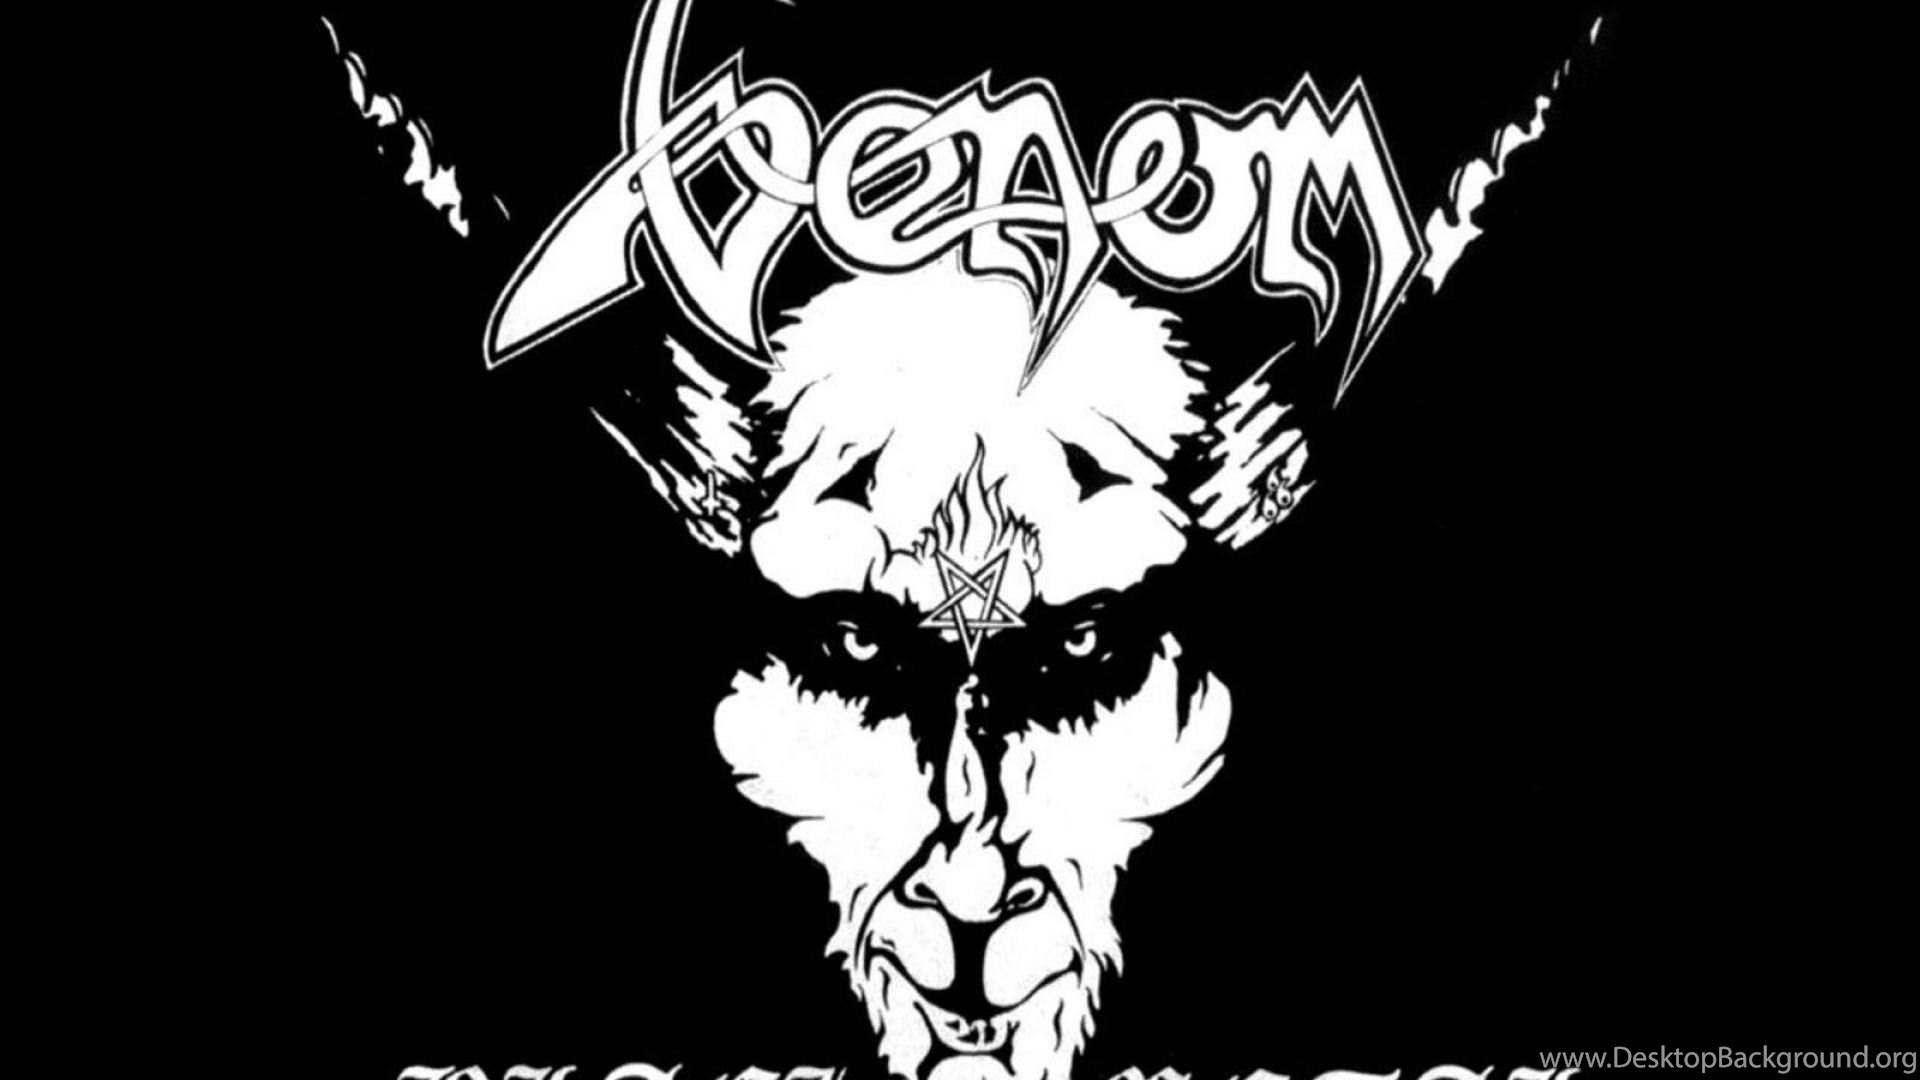 Blackmetal Black Metal Venom Music Hd Wallpapers Desktop Background